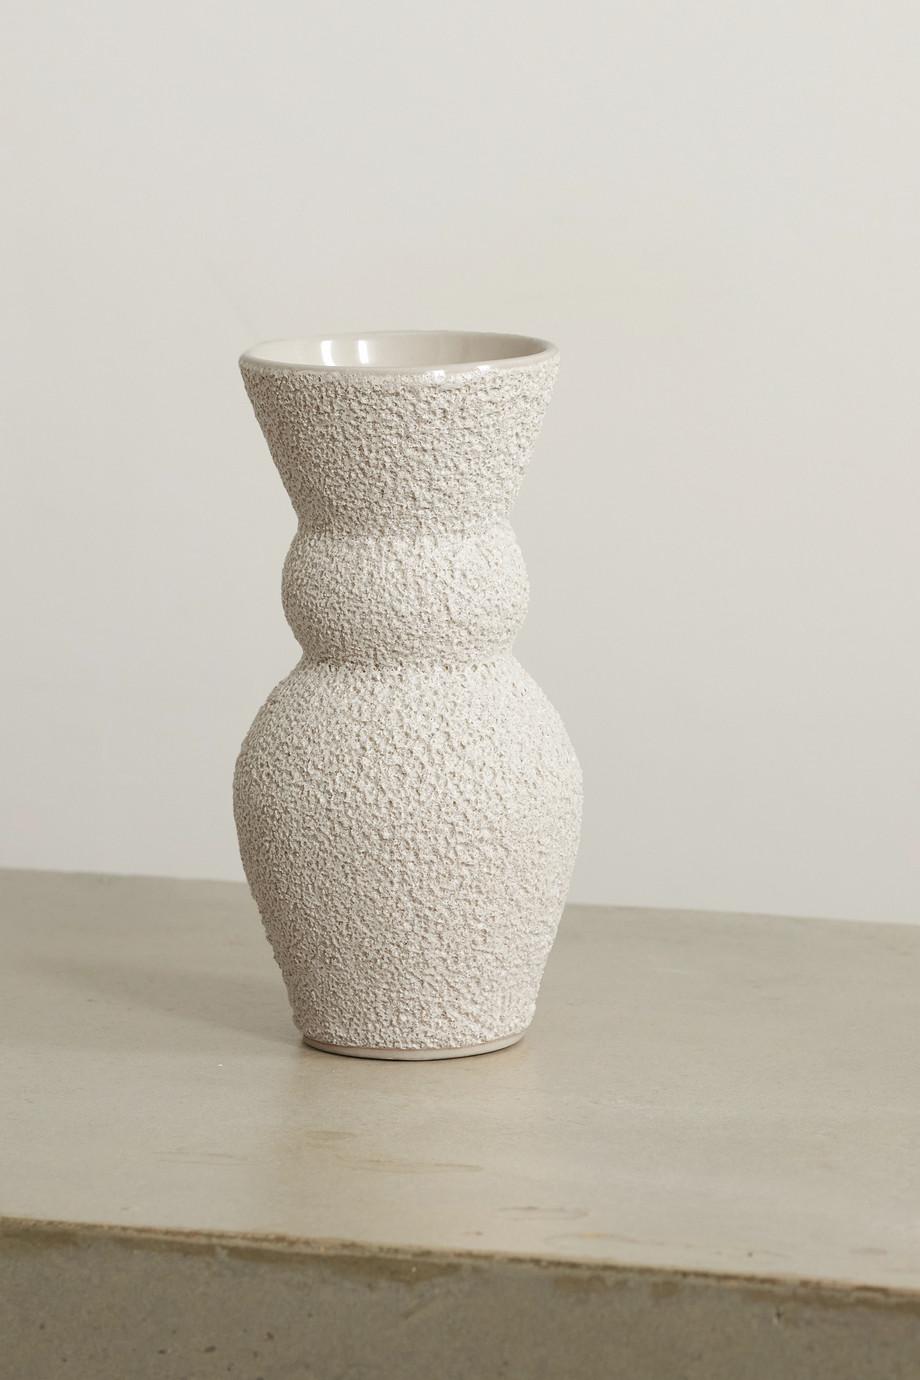 Marloe Marloe Lucie glazed ceramic vase